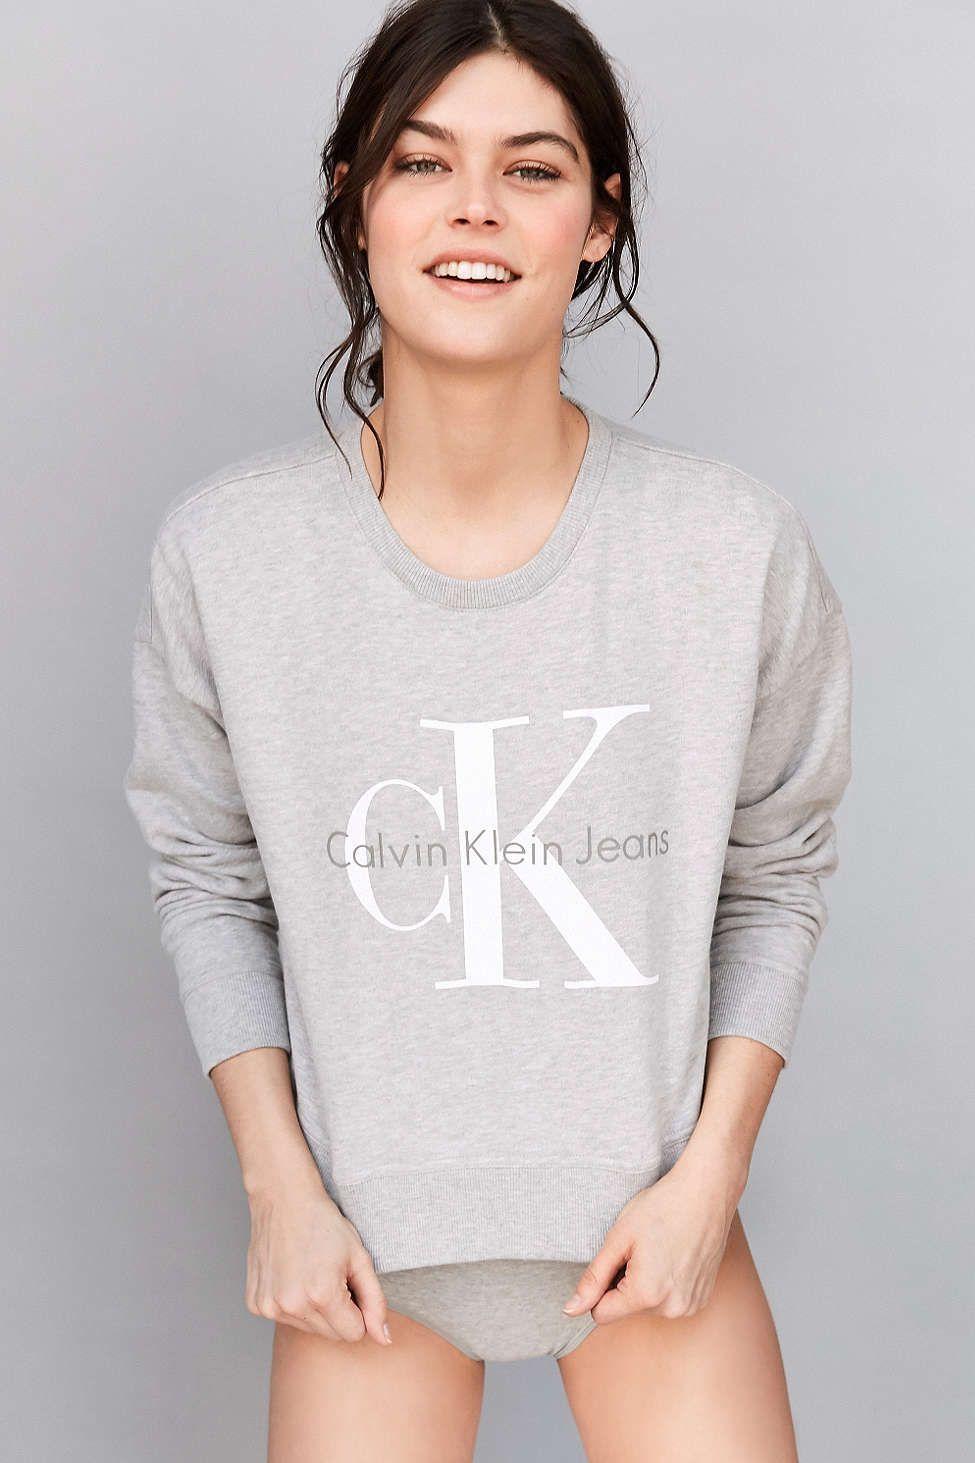 Calvin Klein X UO Cropped Hoodie Sweatshirt - Urban